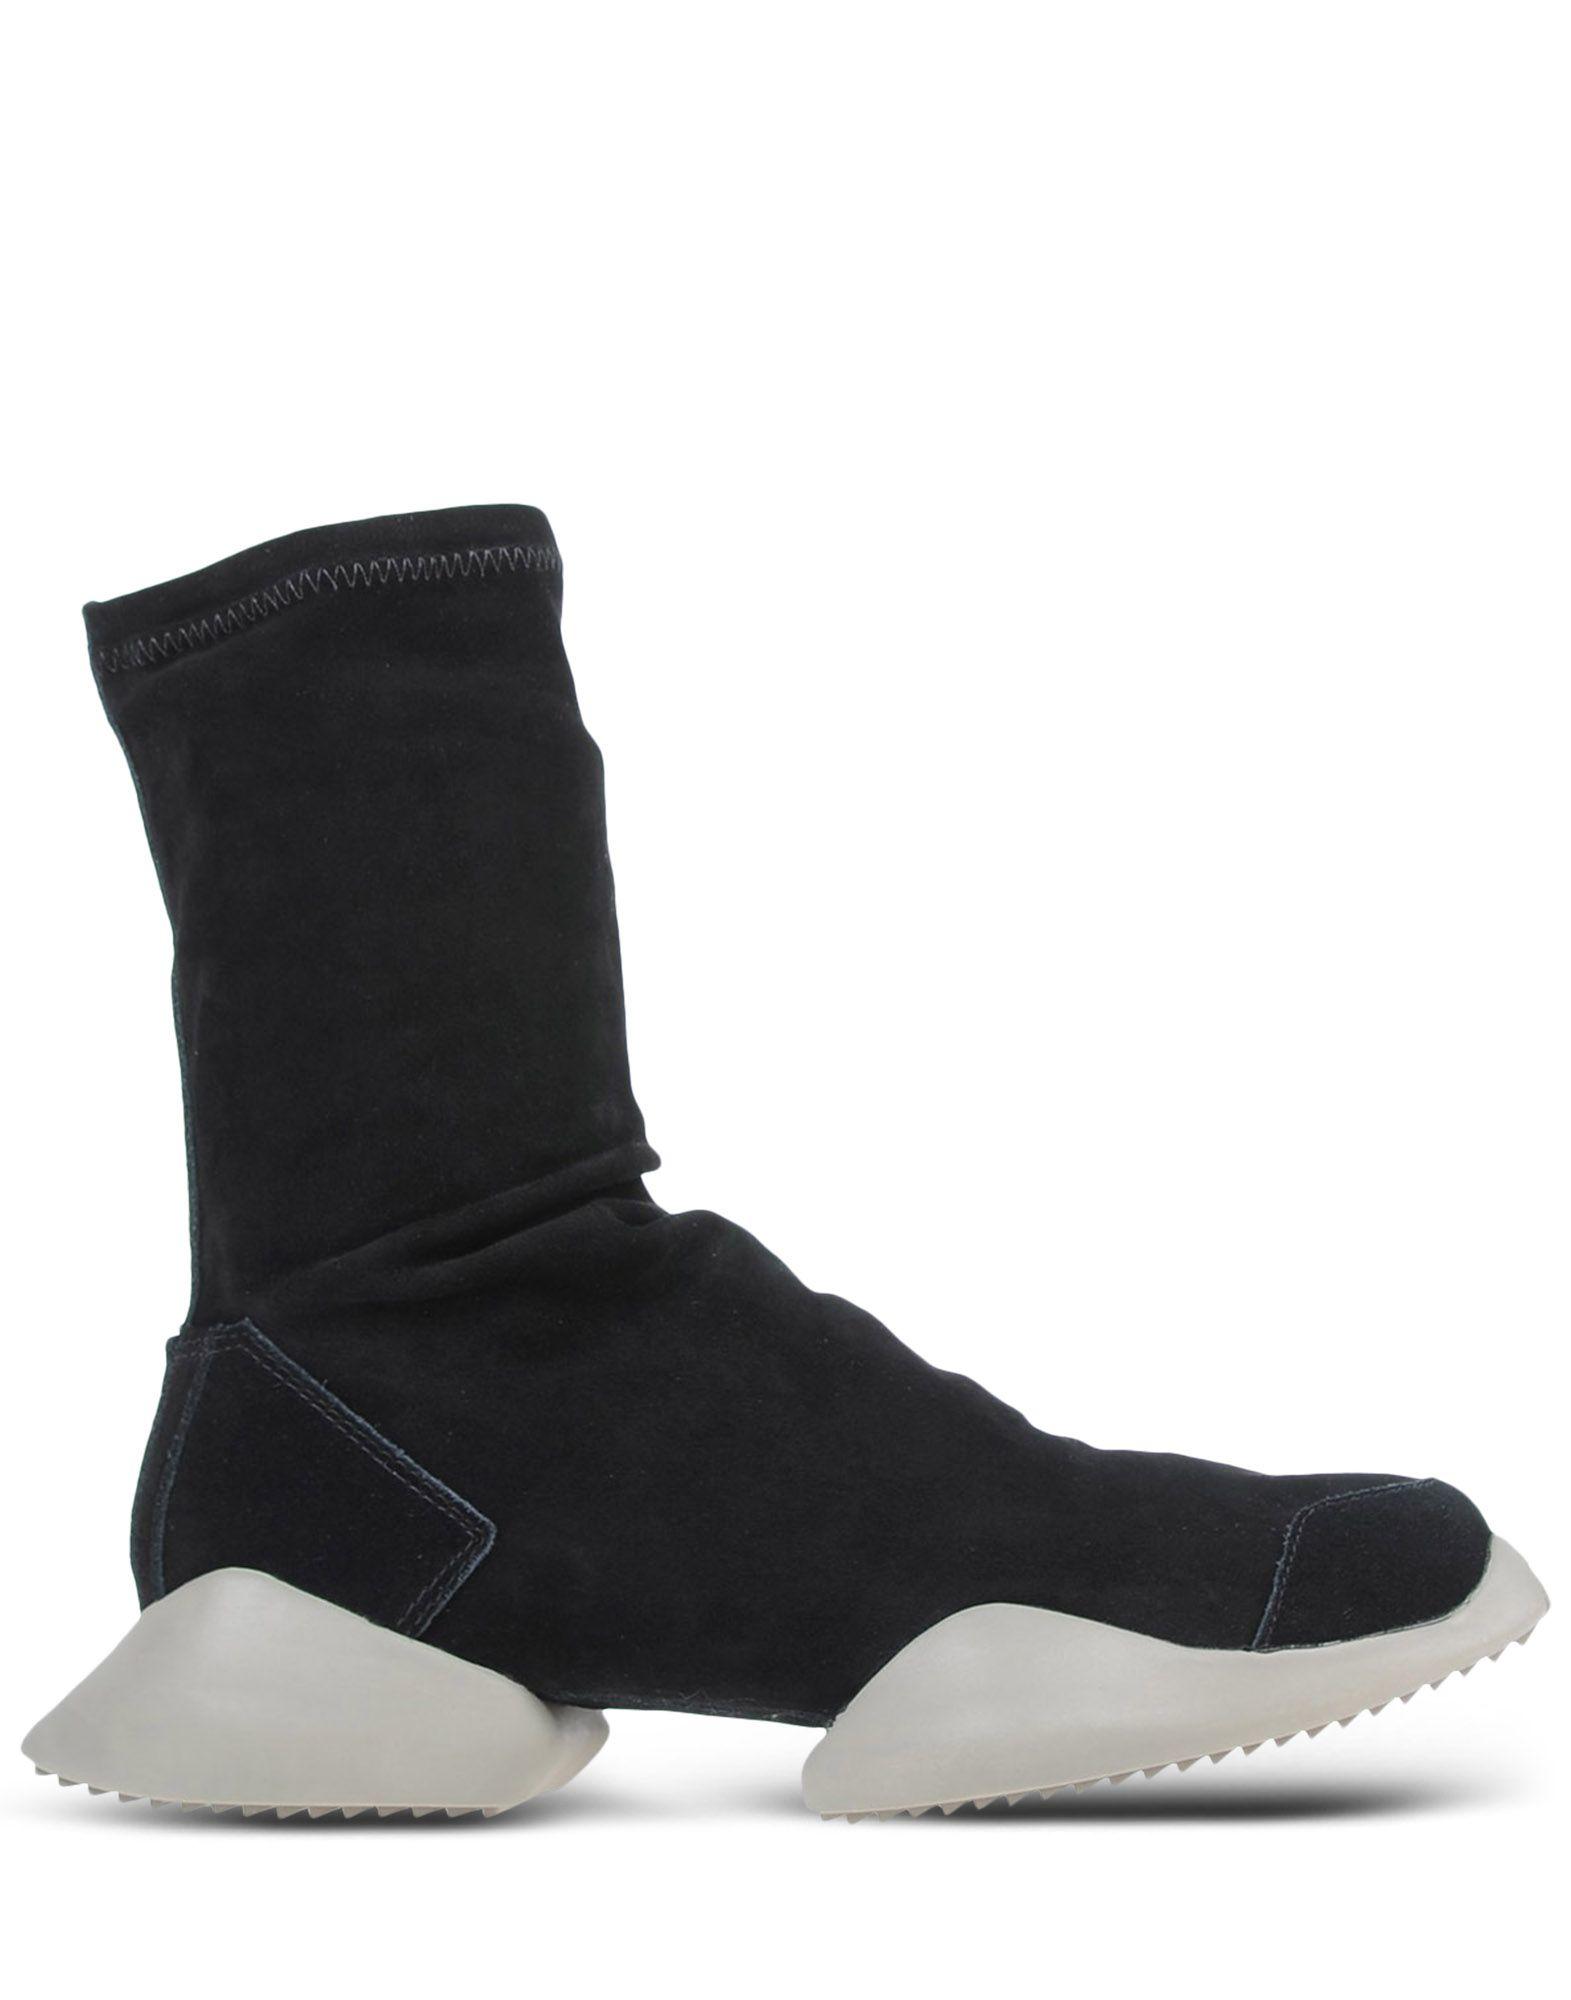 Rick Owens Adidas Shoes Sale